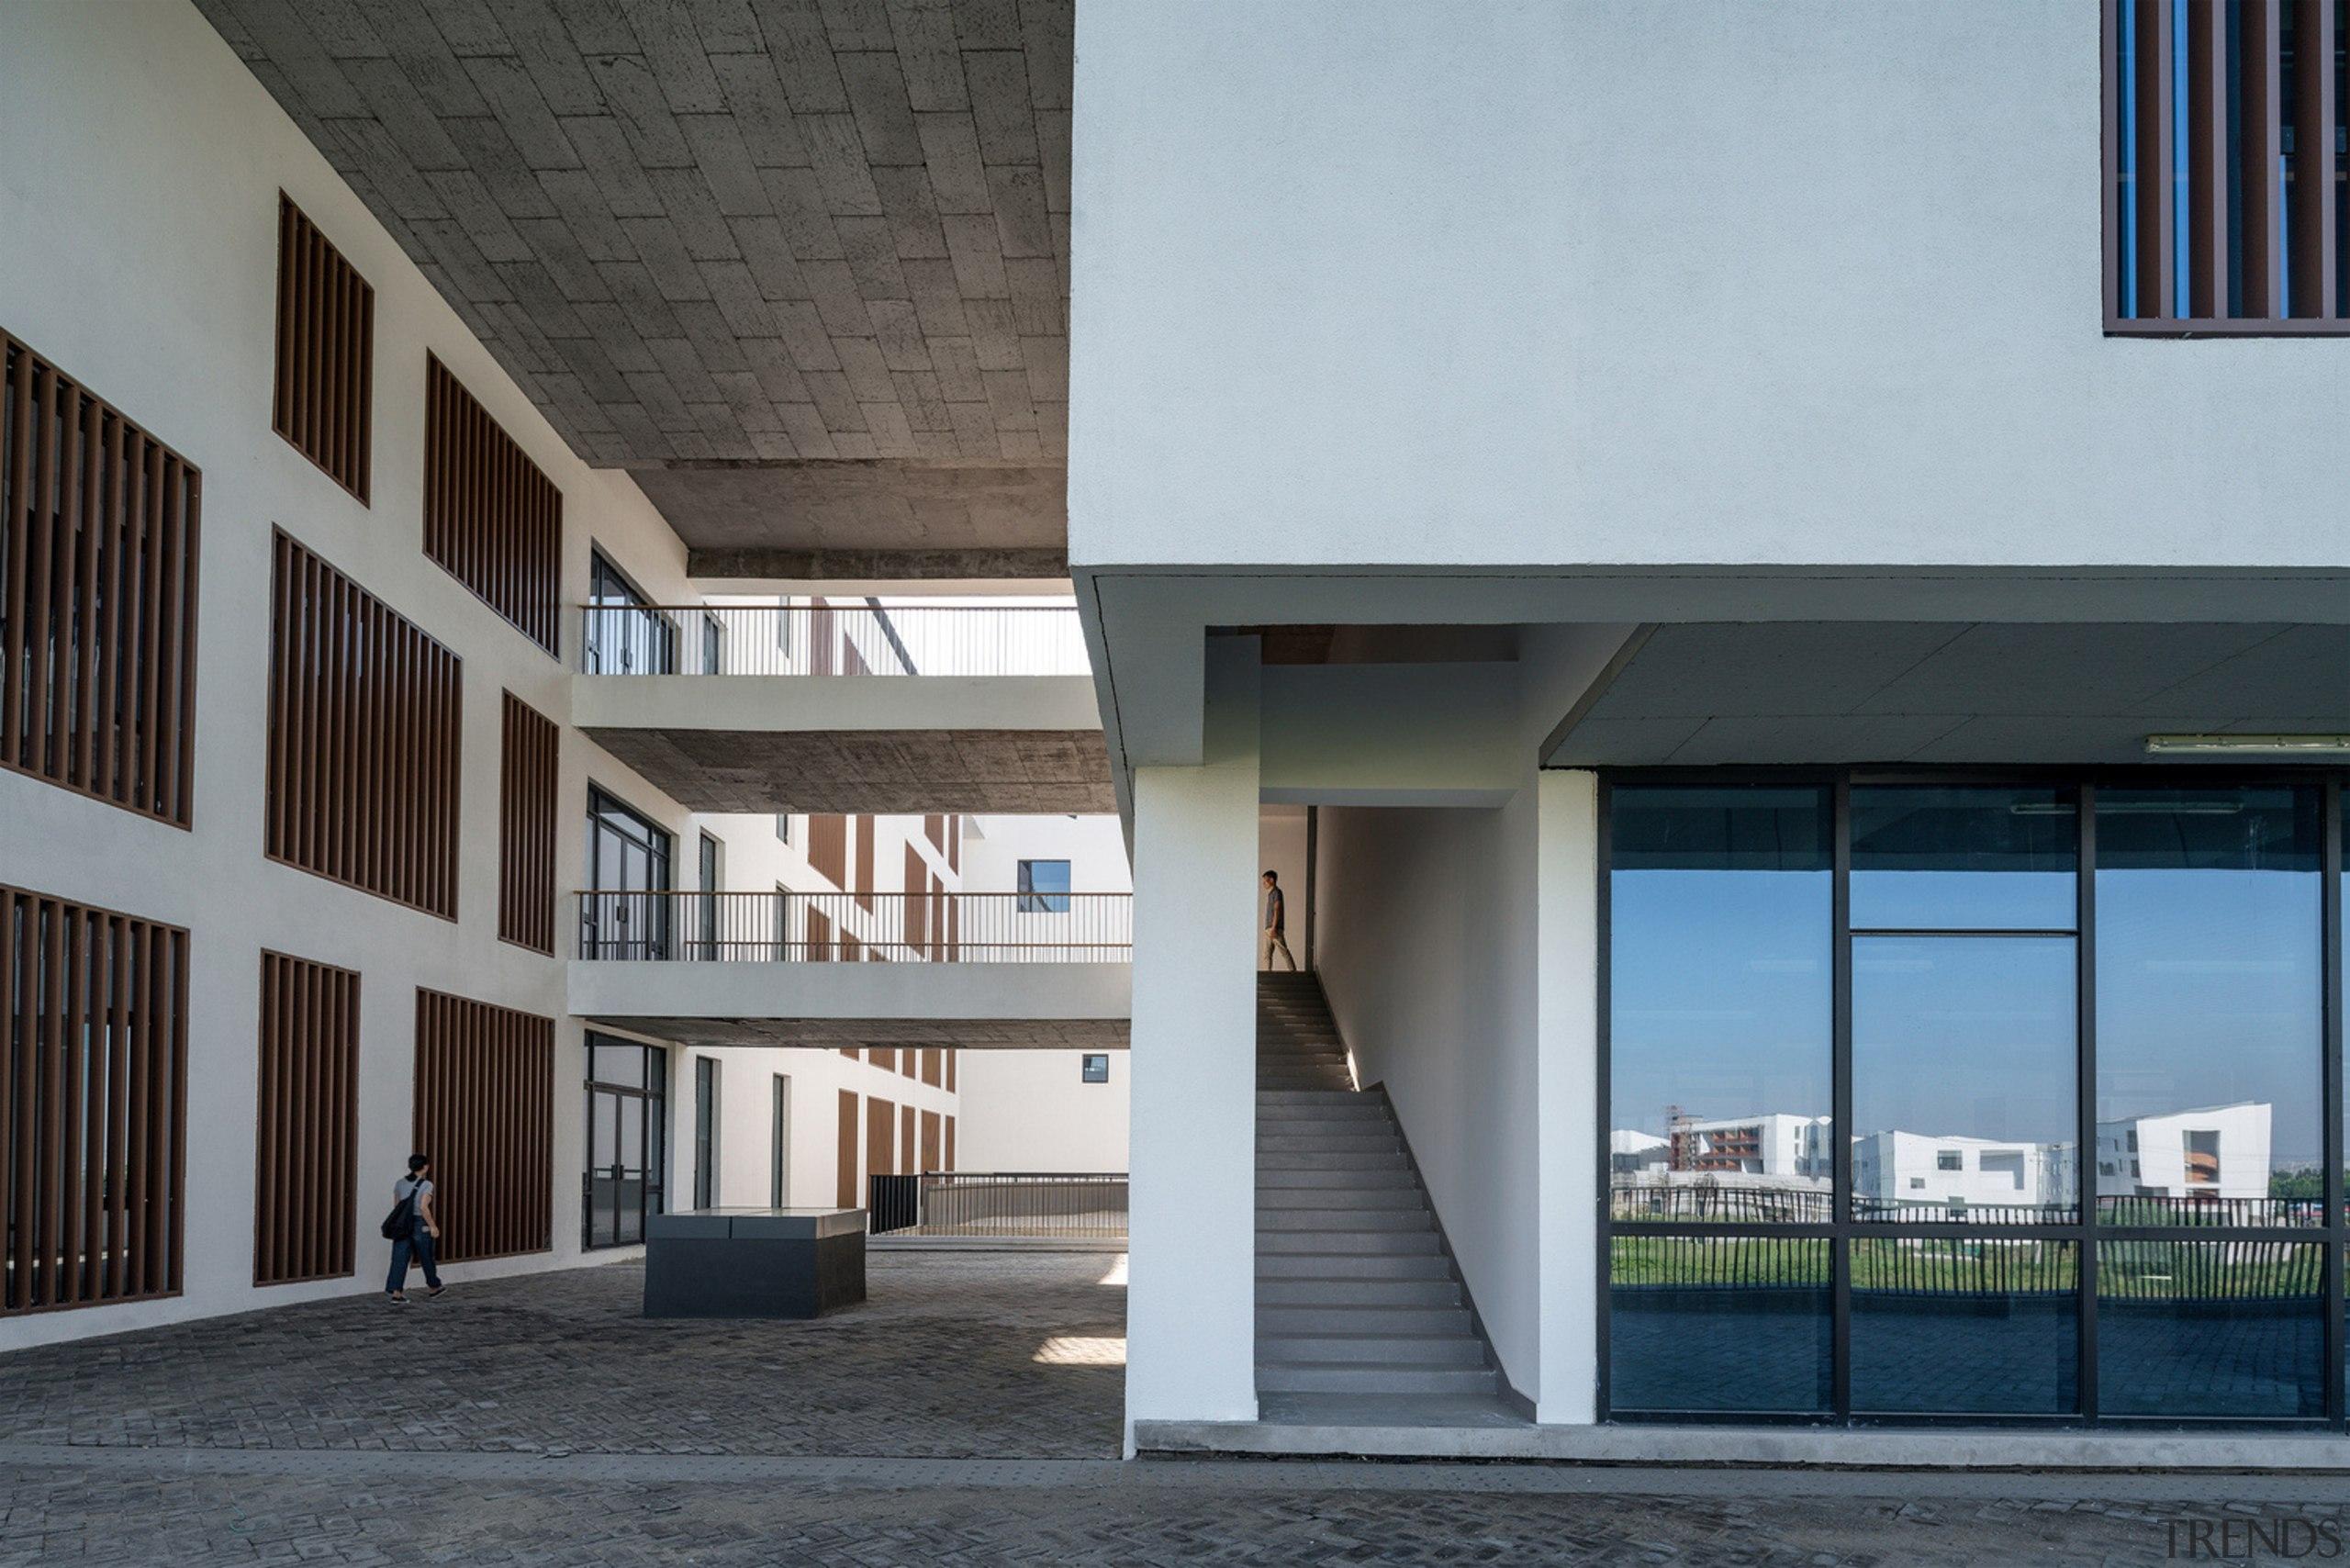 Gallery 8 - architecture   building   condominium architecture, building, condominium, facade, house, window, gray, black